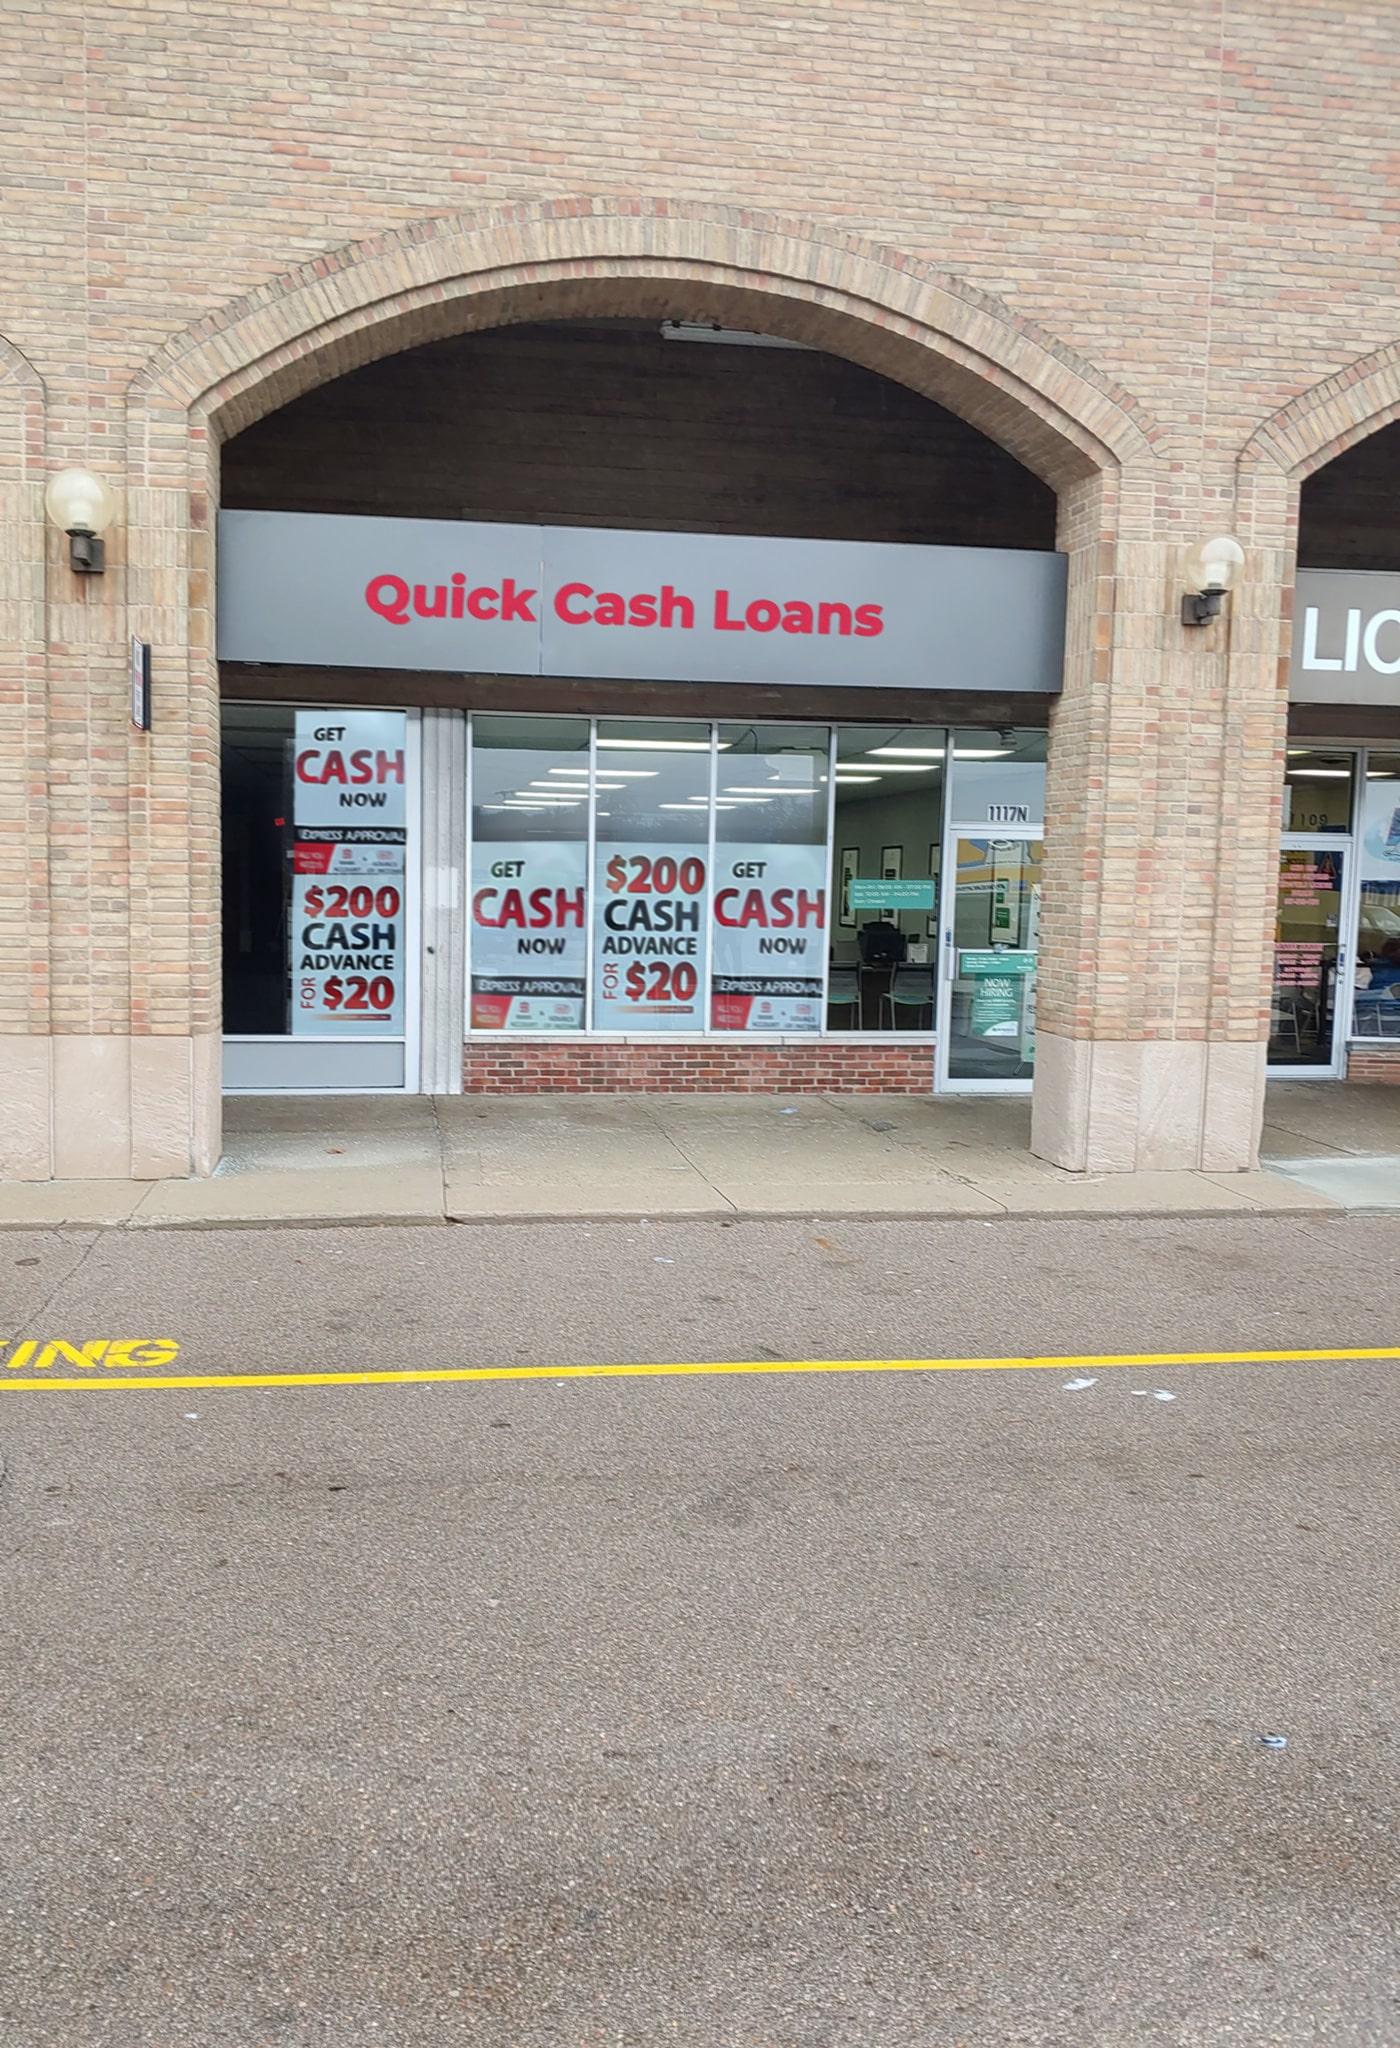 Quick Cash Loans in Cincinnati, OH 45236